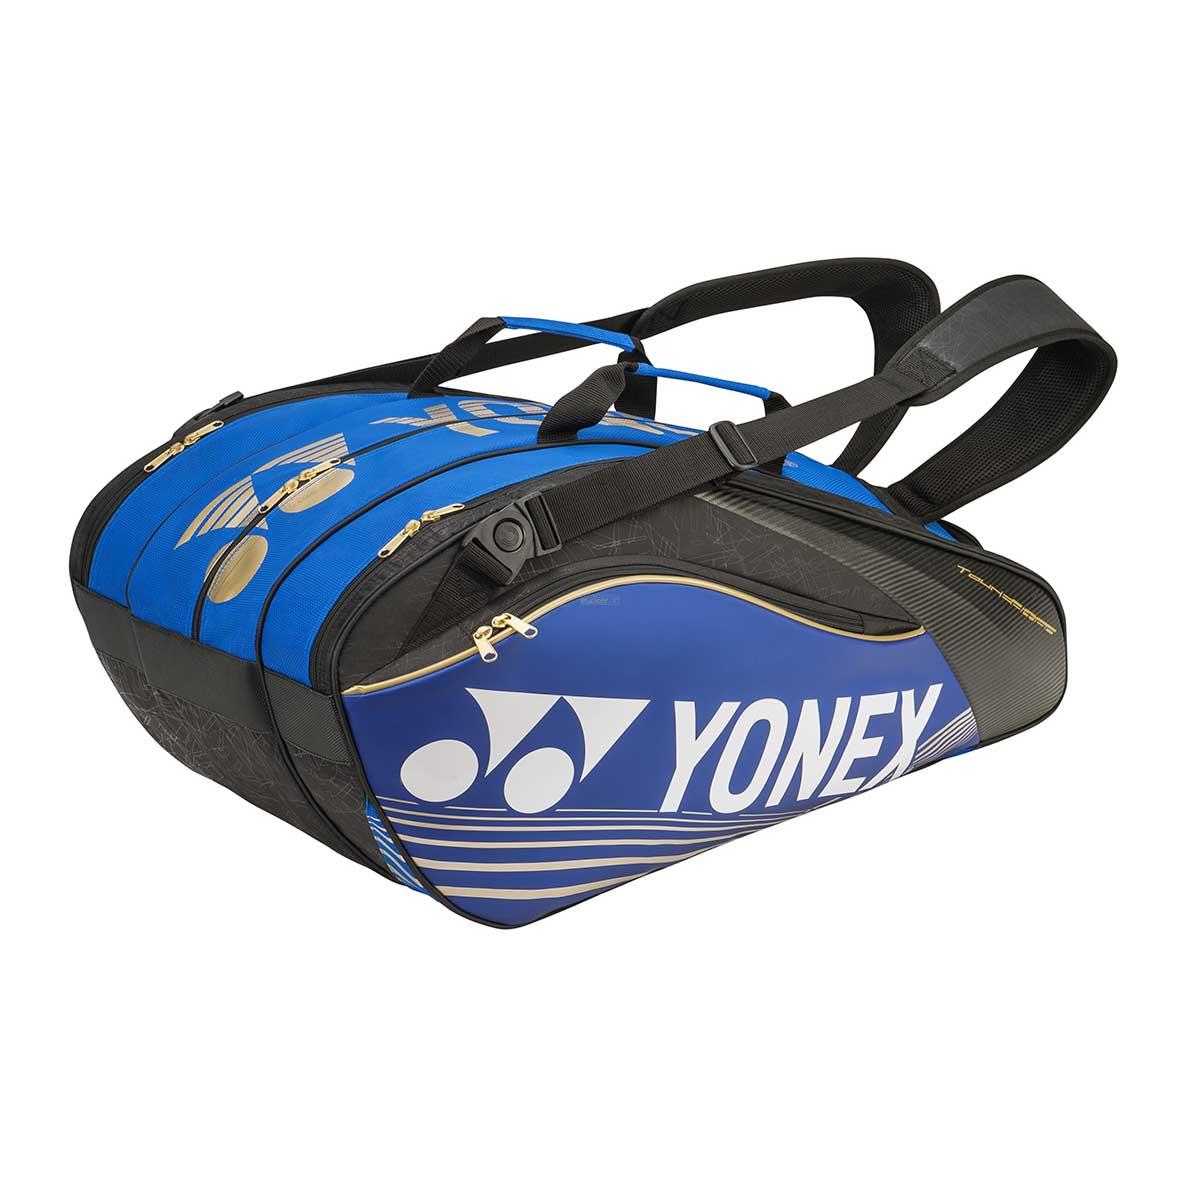 4f9633534fa Buy YONEX SUNR 9629TG BT9 Badminton Kit Bag (Blue) Online